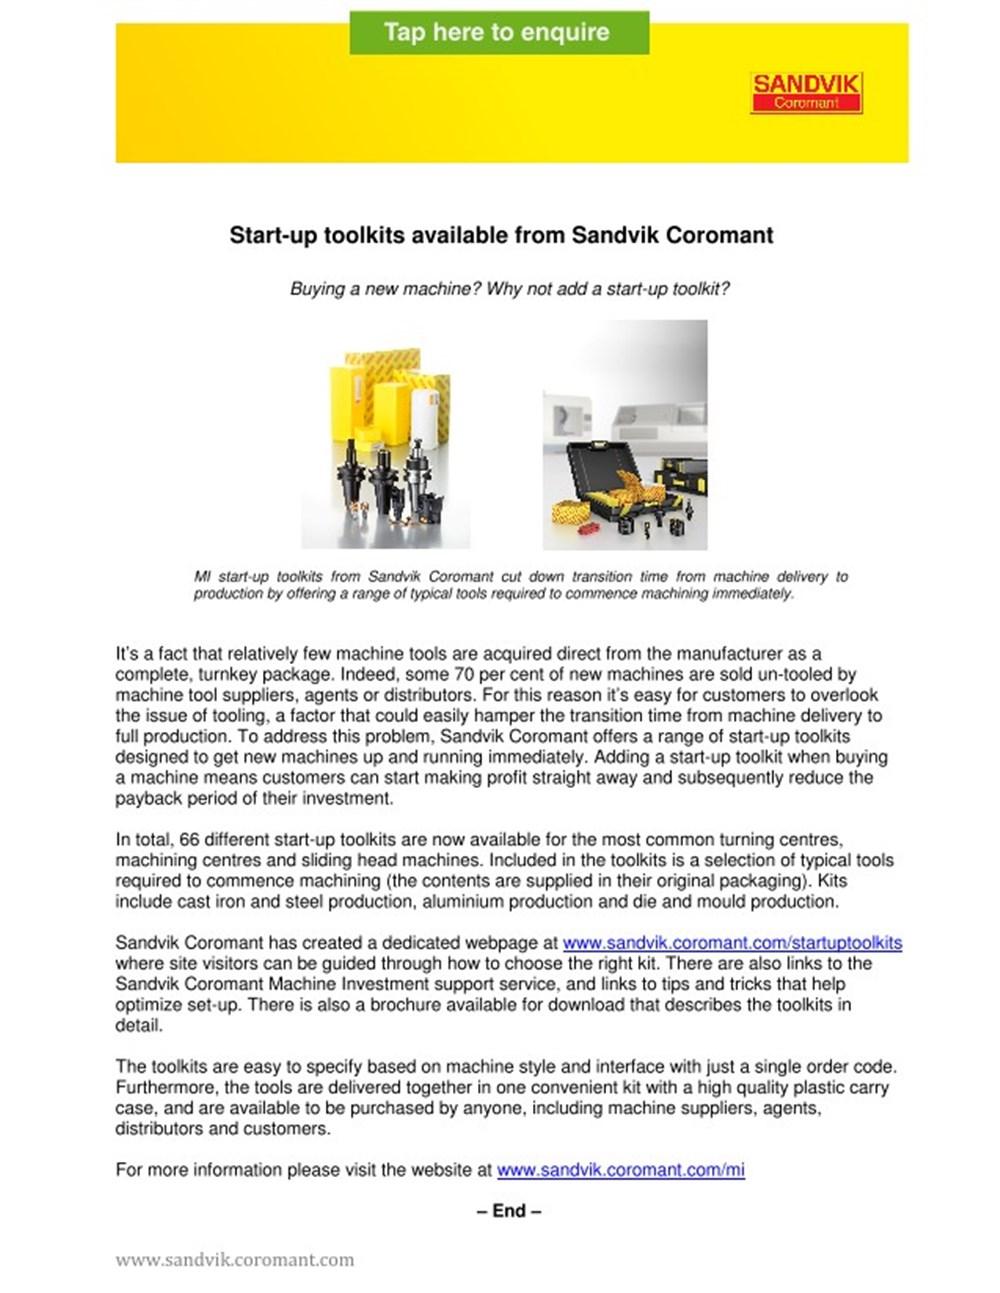 Start-up Toolkits from Sandvik Coromant - Brochure